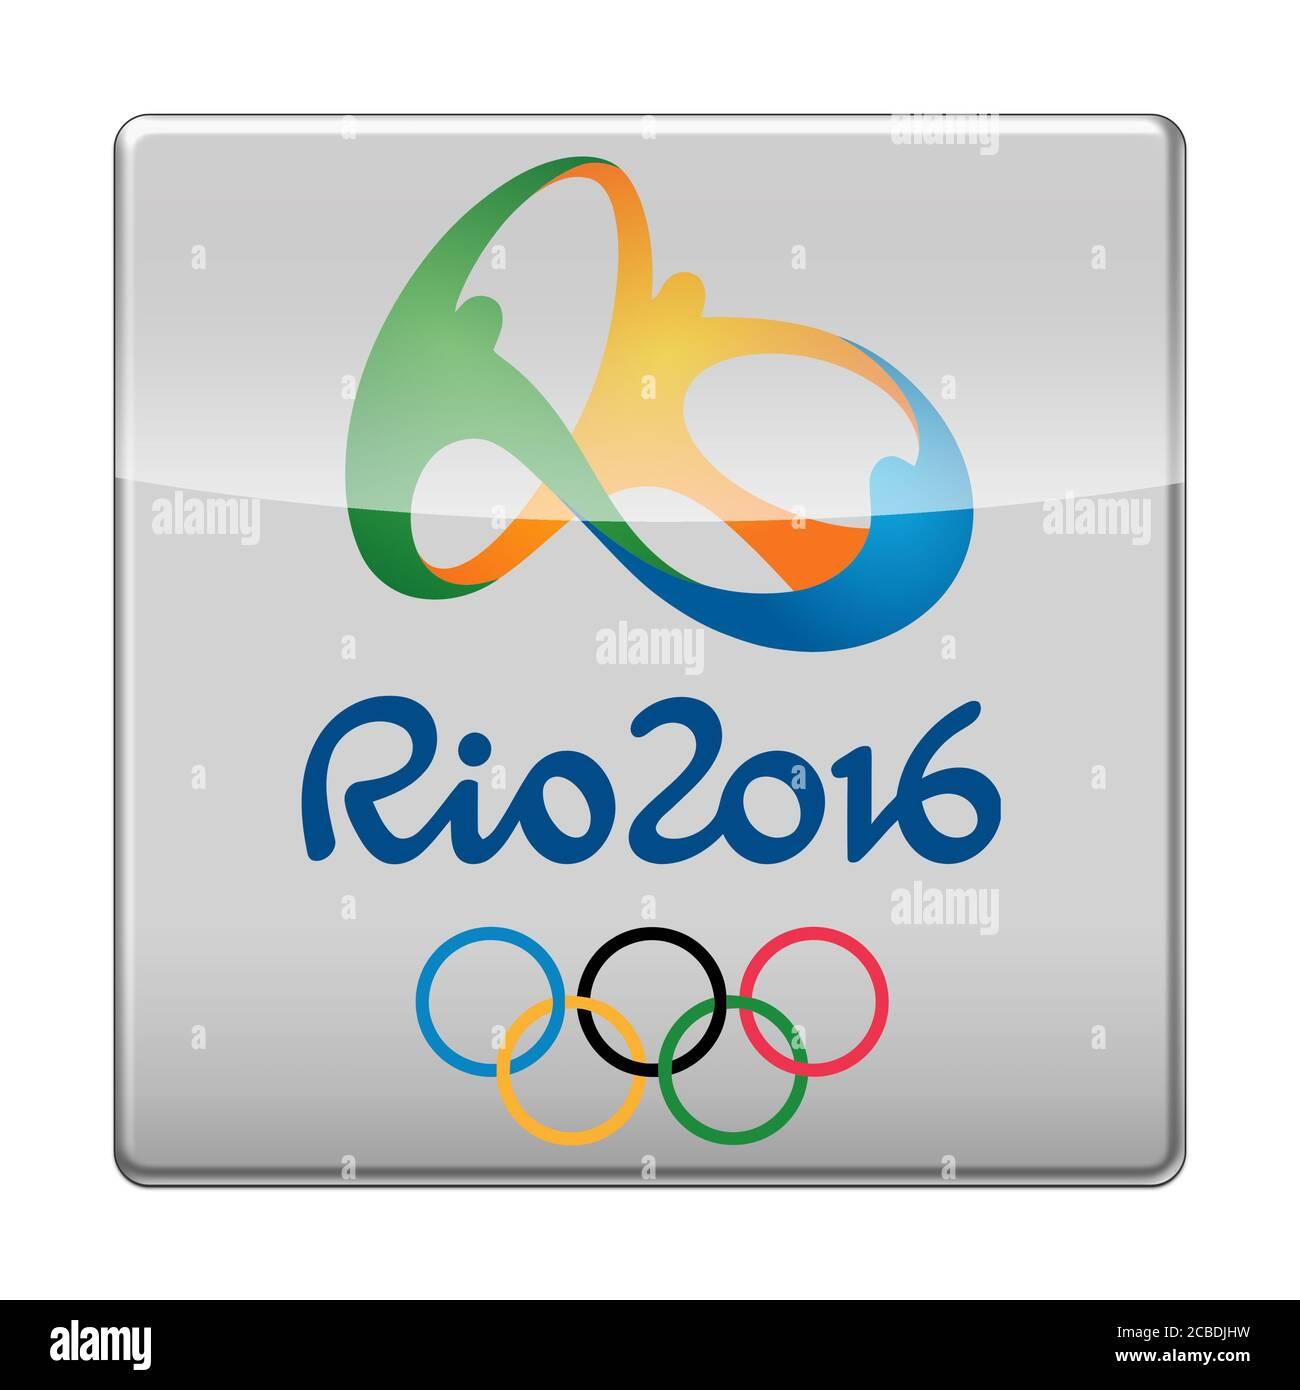 Olimpiadas de Verano de 2016 en Brasil Foto de stock